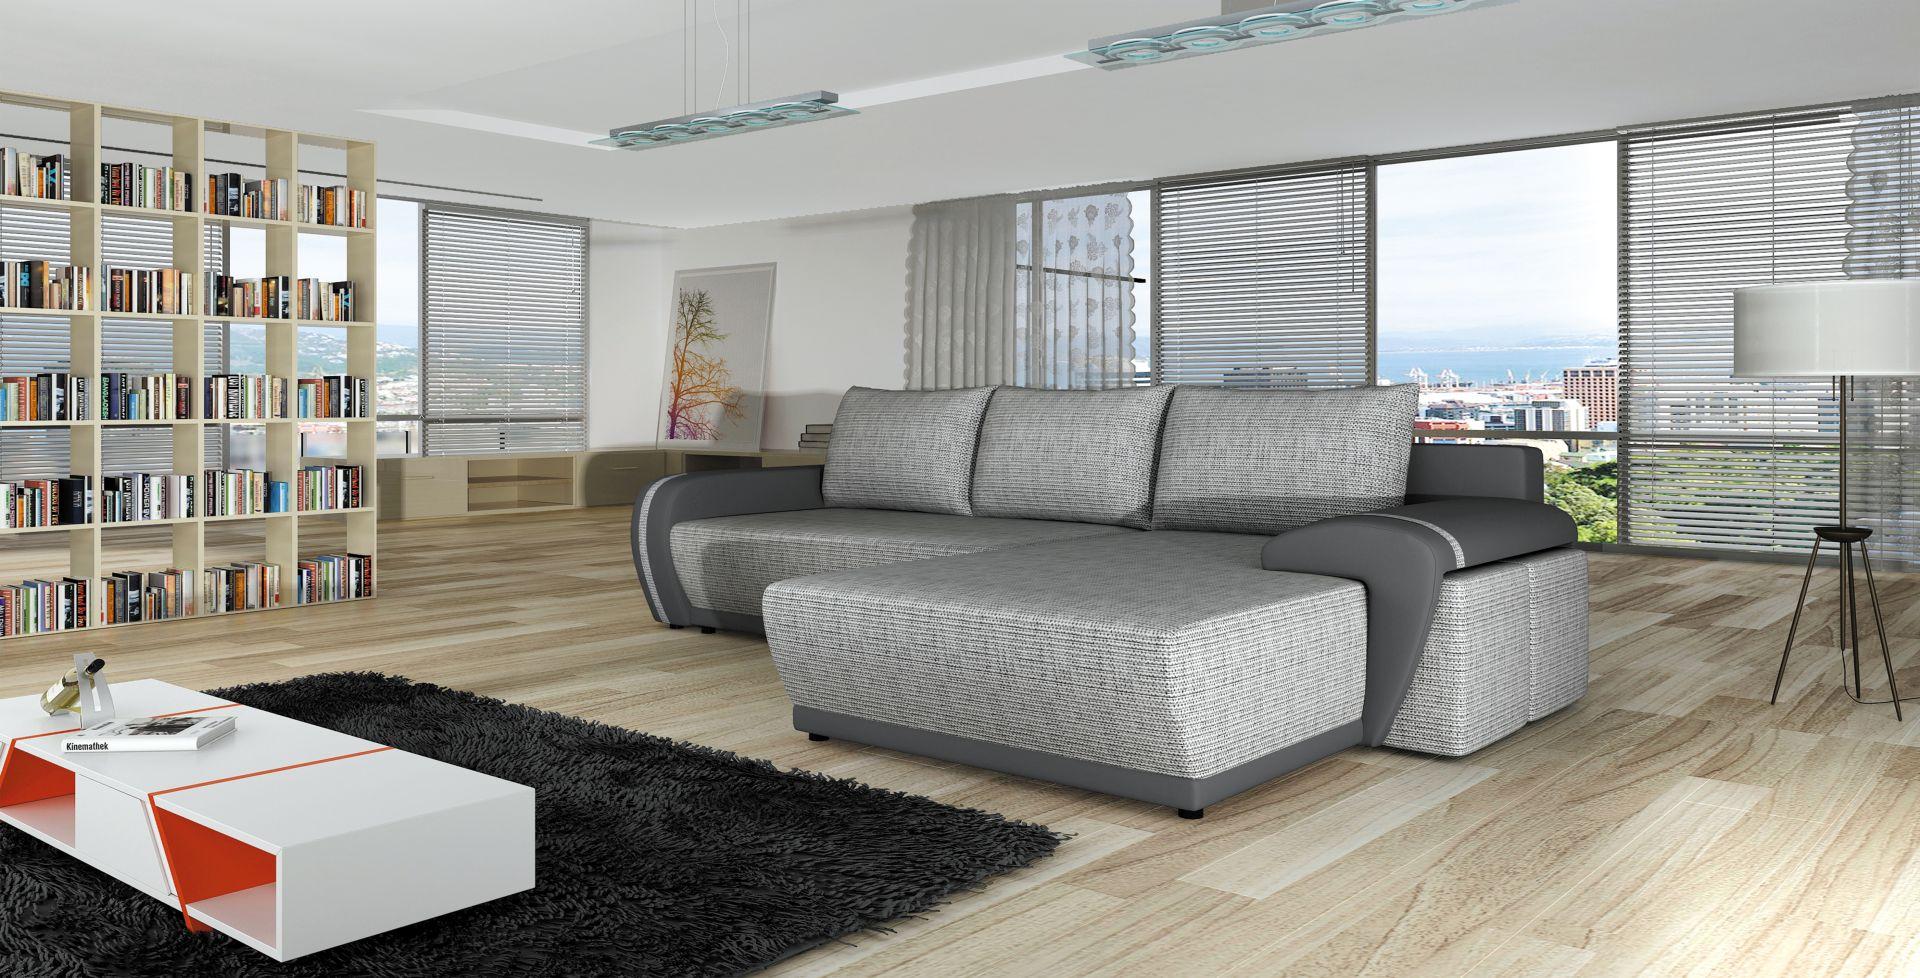 sofa schlafsofa designer sofa mit bettfunktion bettkasten ecksofa couch neu 4 you www. Black Bedroom Furniture Sets. Home Design Ideas